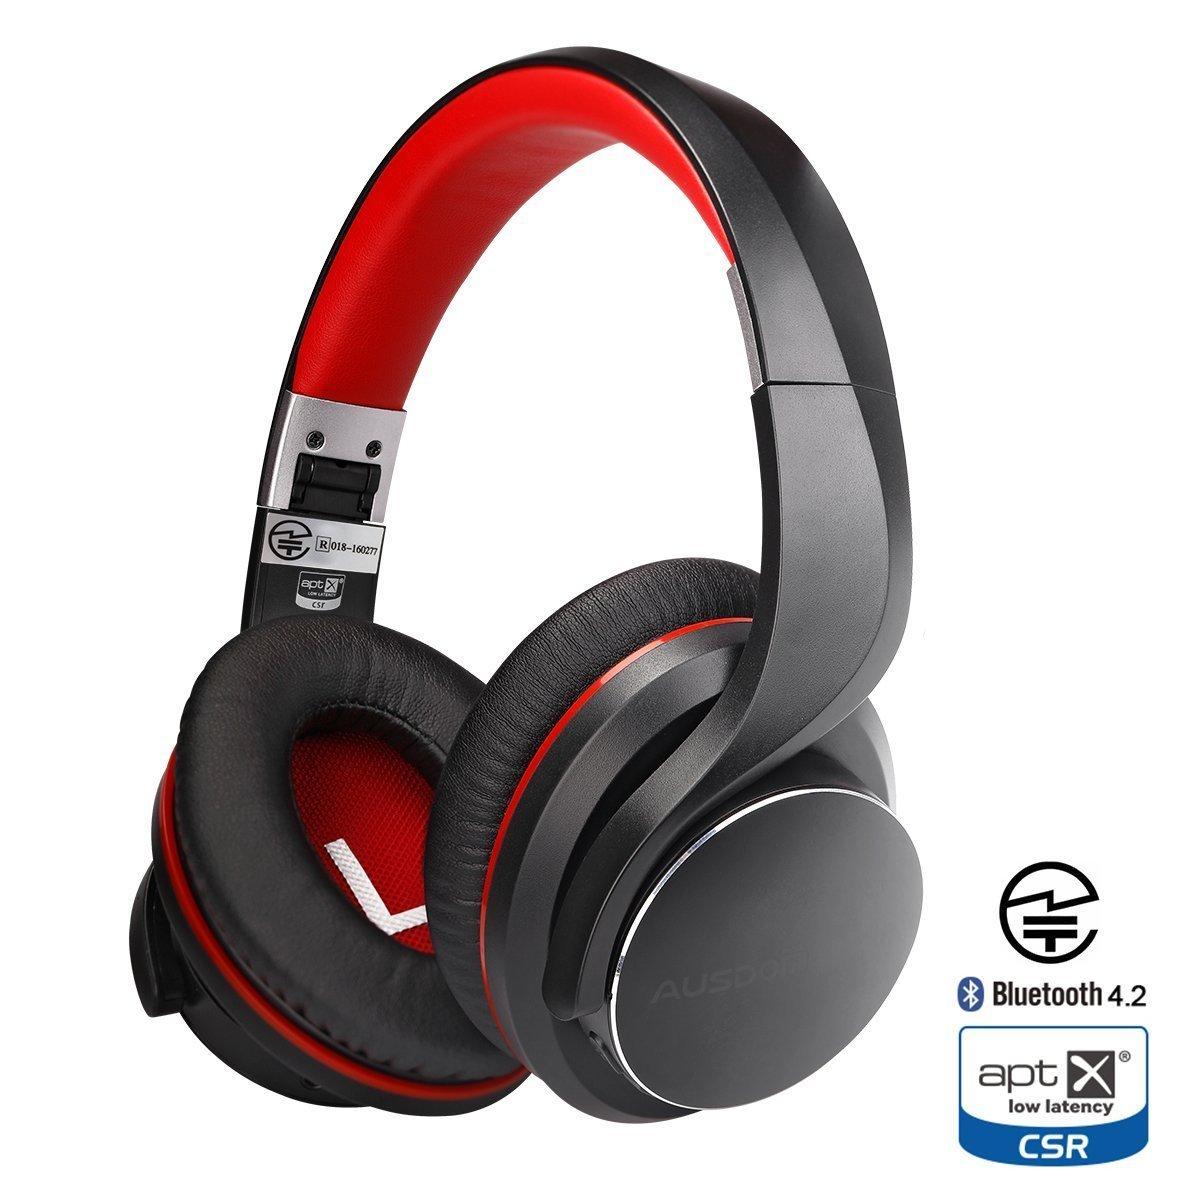 ausdom ah3 wireless bluetooth headphones headset review. Black Bedroom Furniture Sets. Home Design Ideas